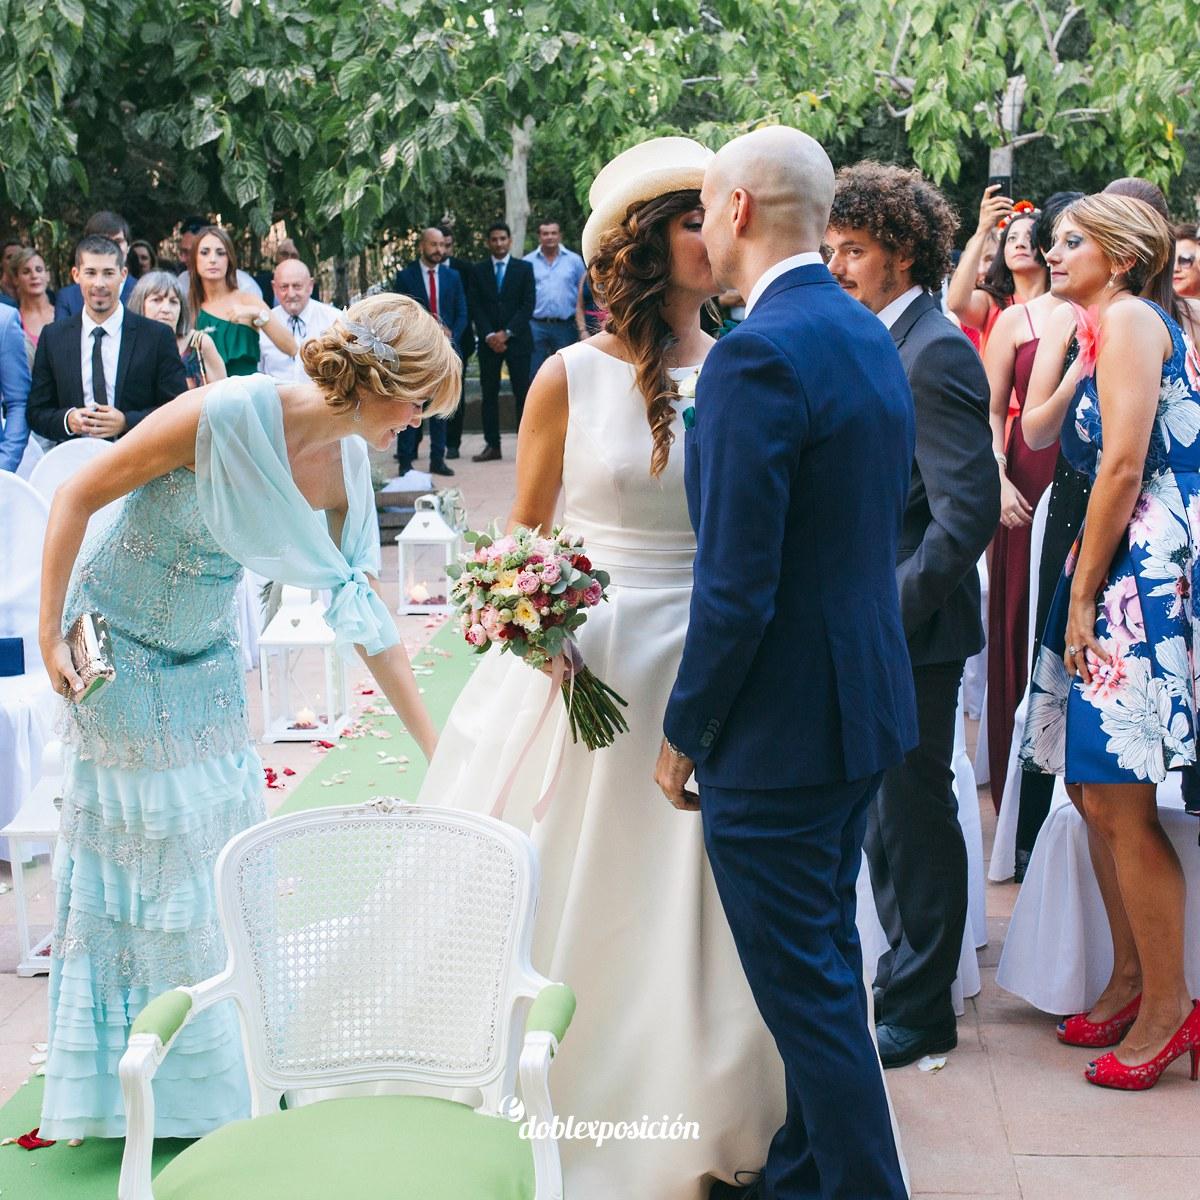 fotografos-boda-finca-restaurante-jardines-nou-cucuch-elche-novelda_0020